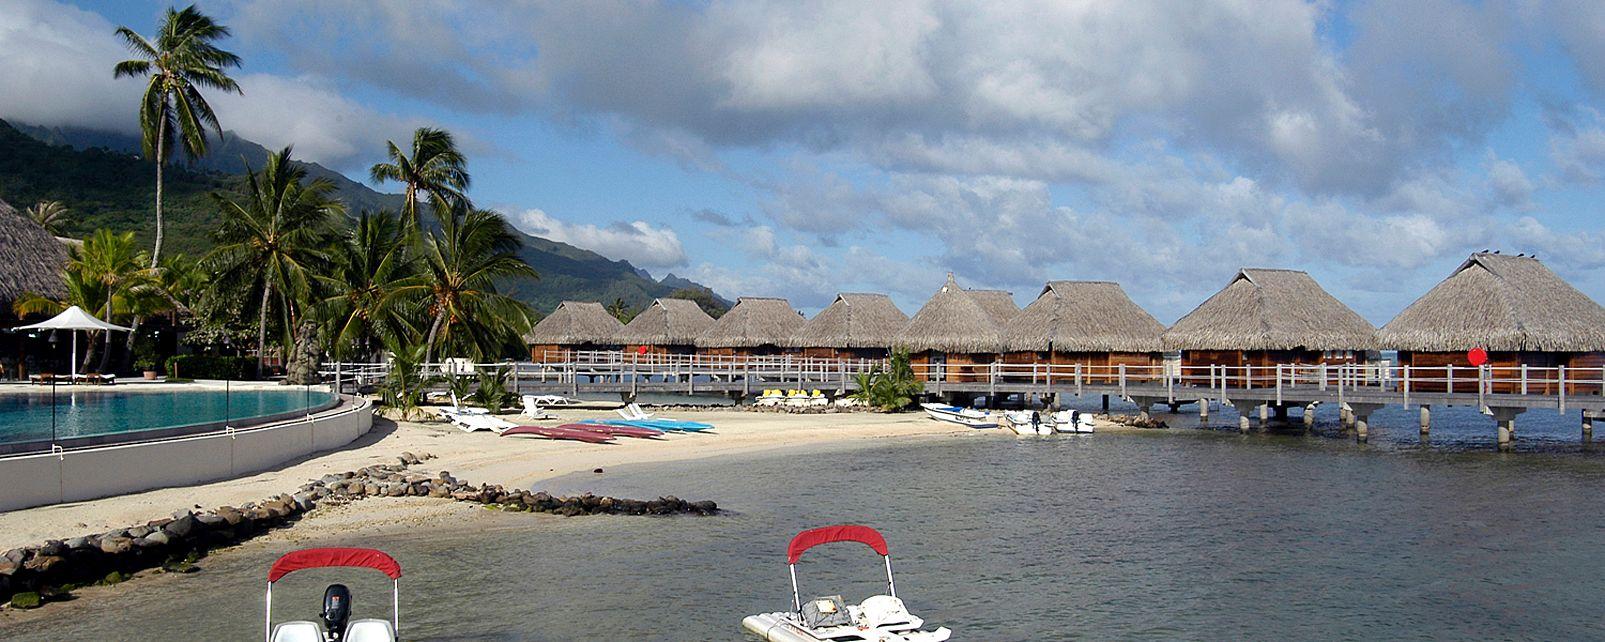 Hôtel Moorea Pearl Resort and Spa